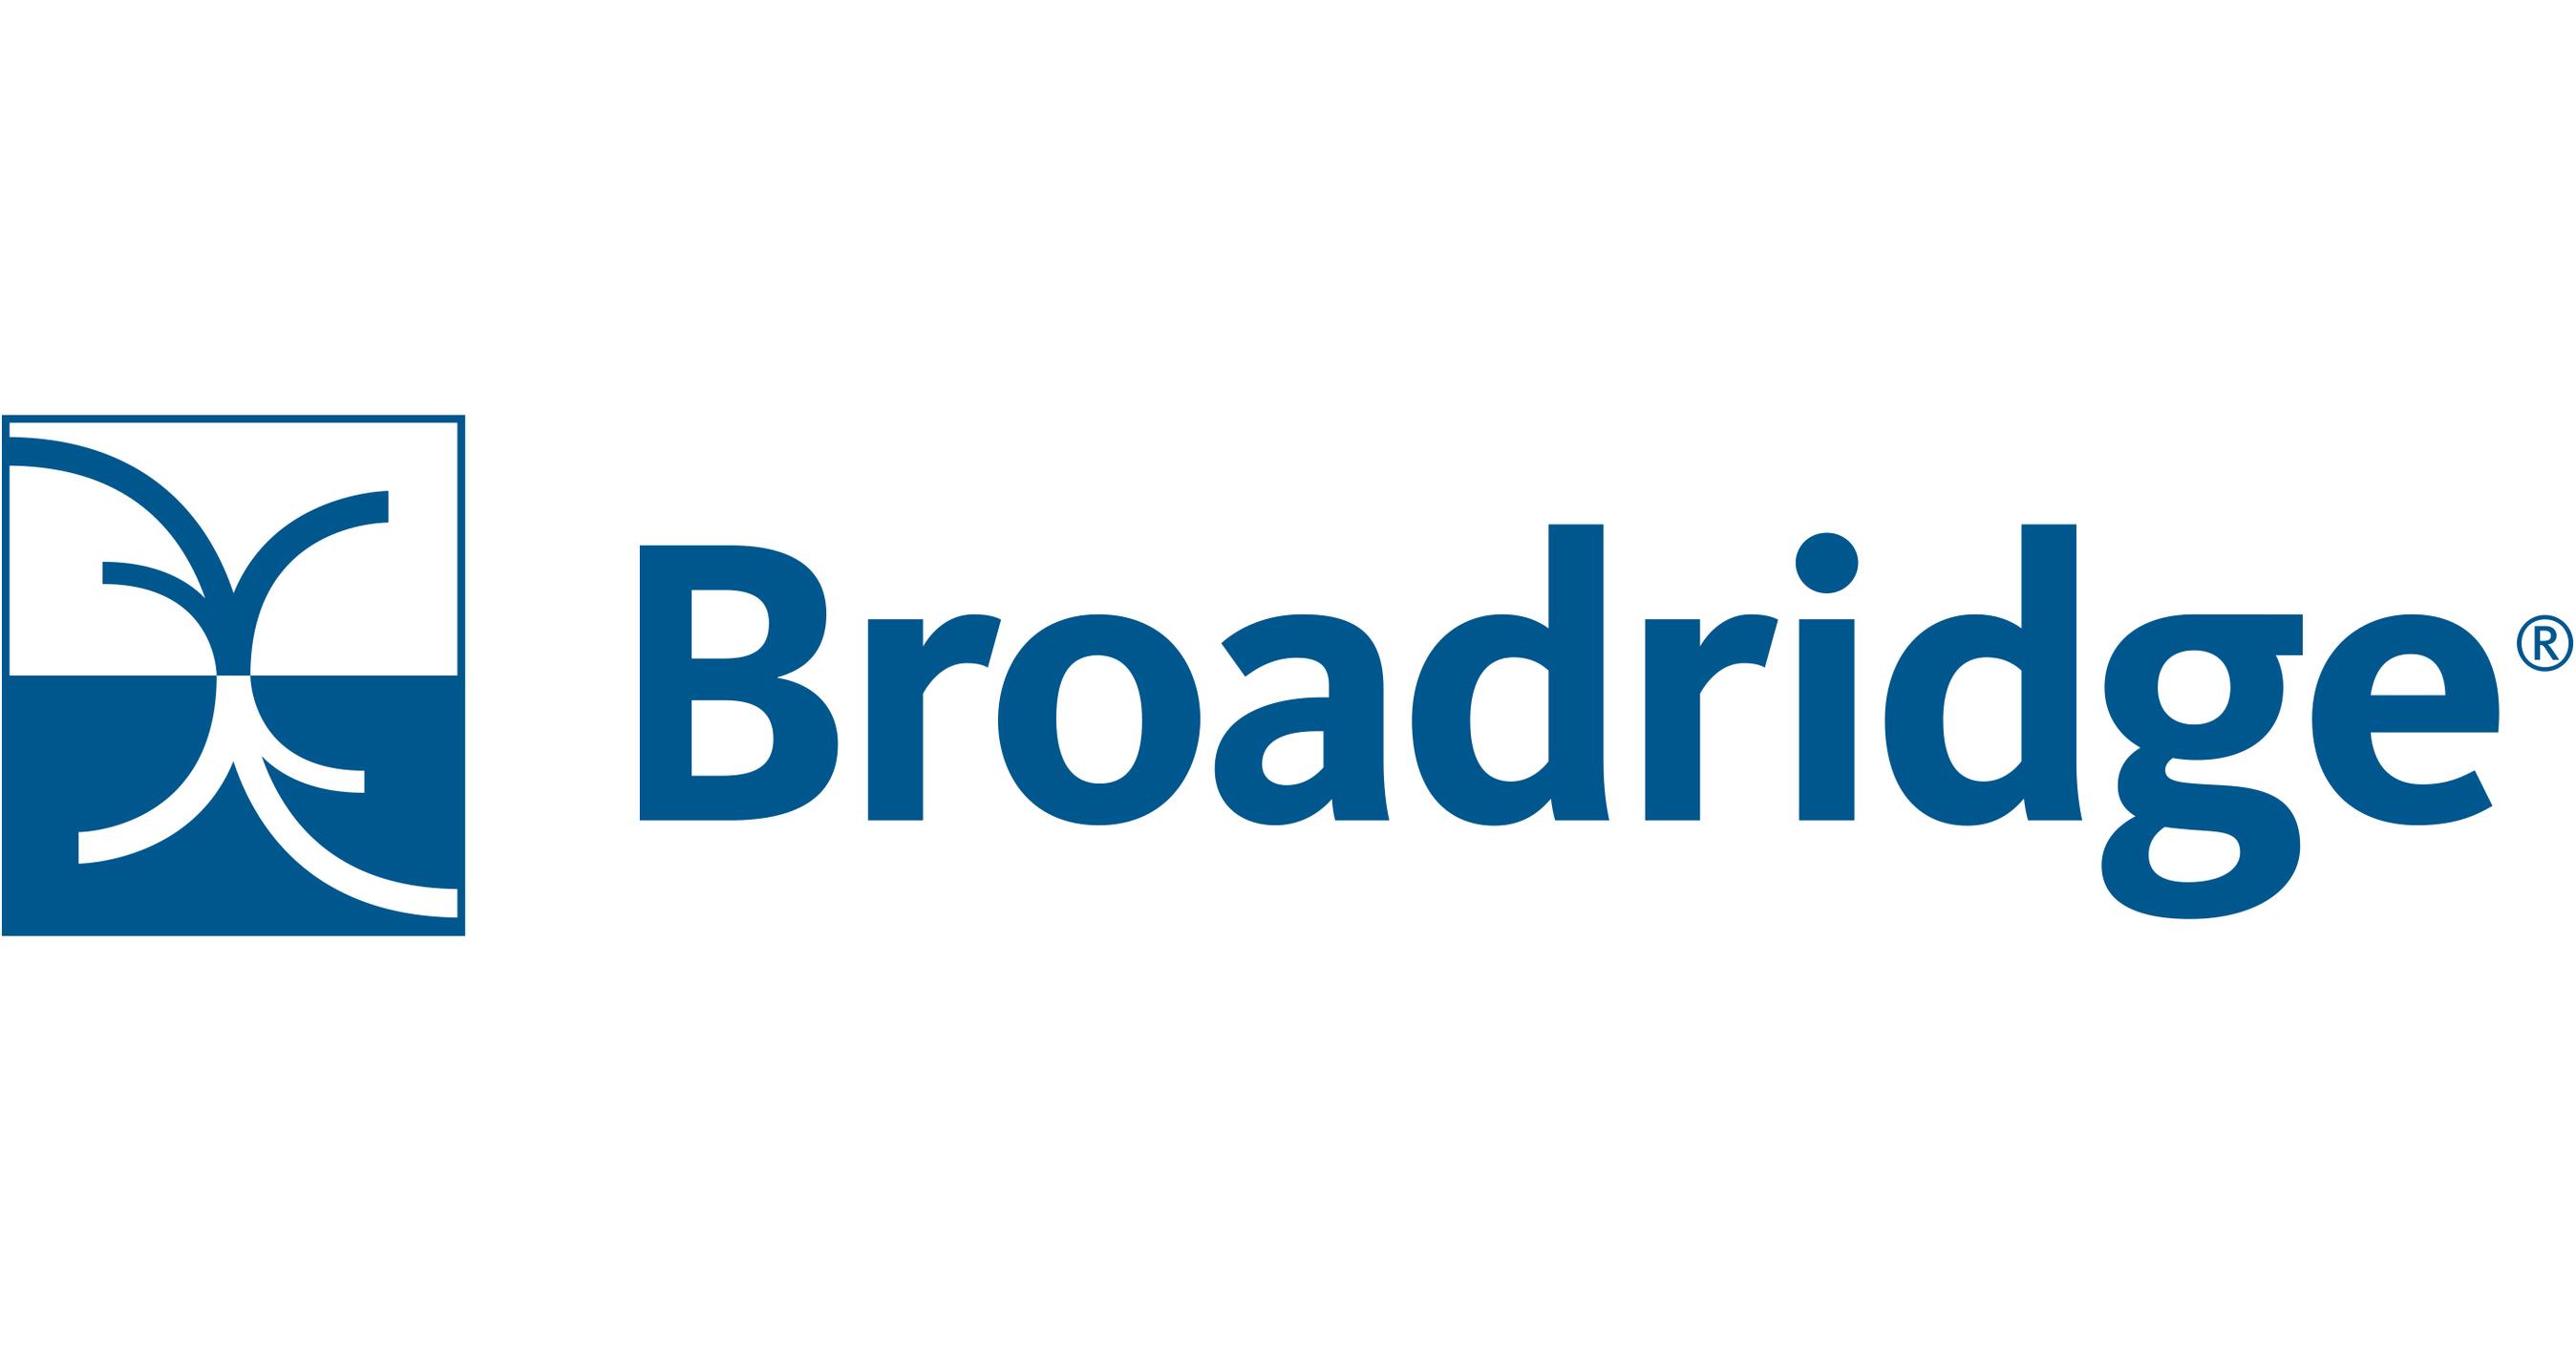 Broadridge Acquires Innovative Post-Trade Solutions Business